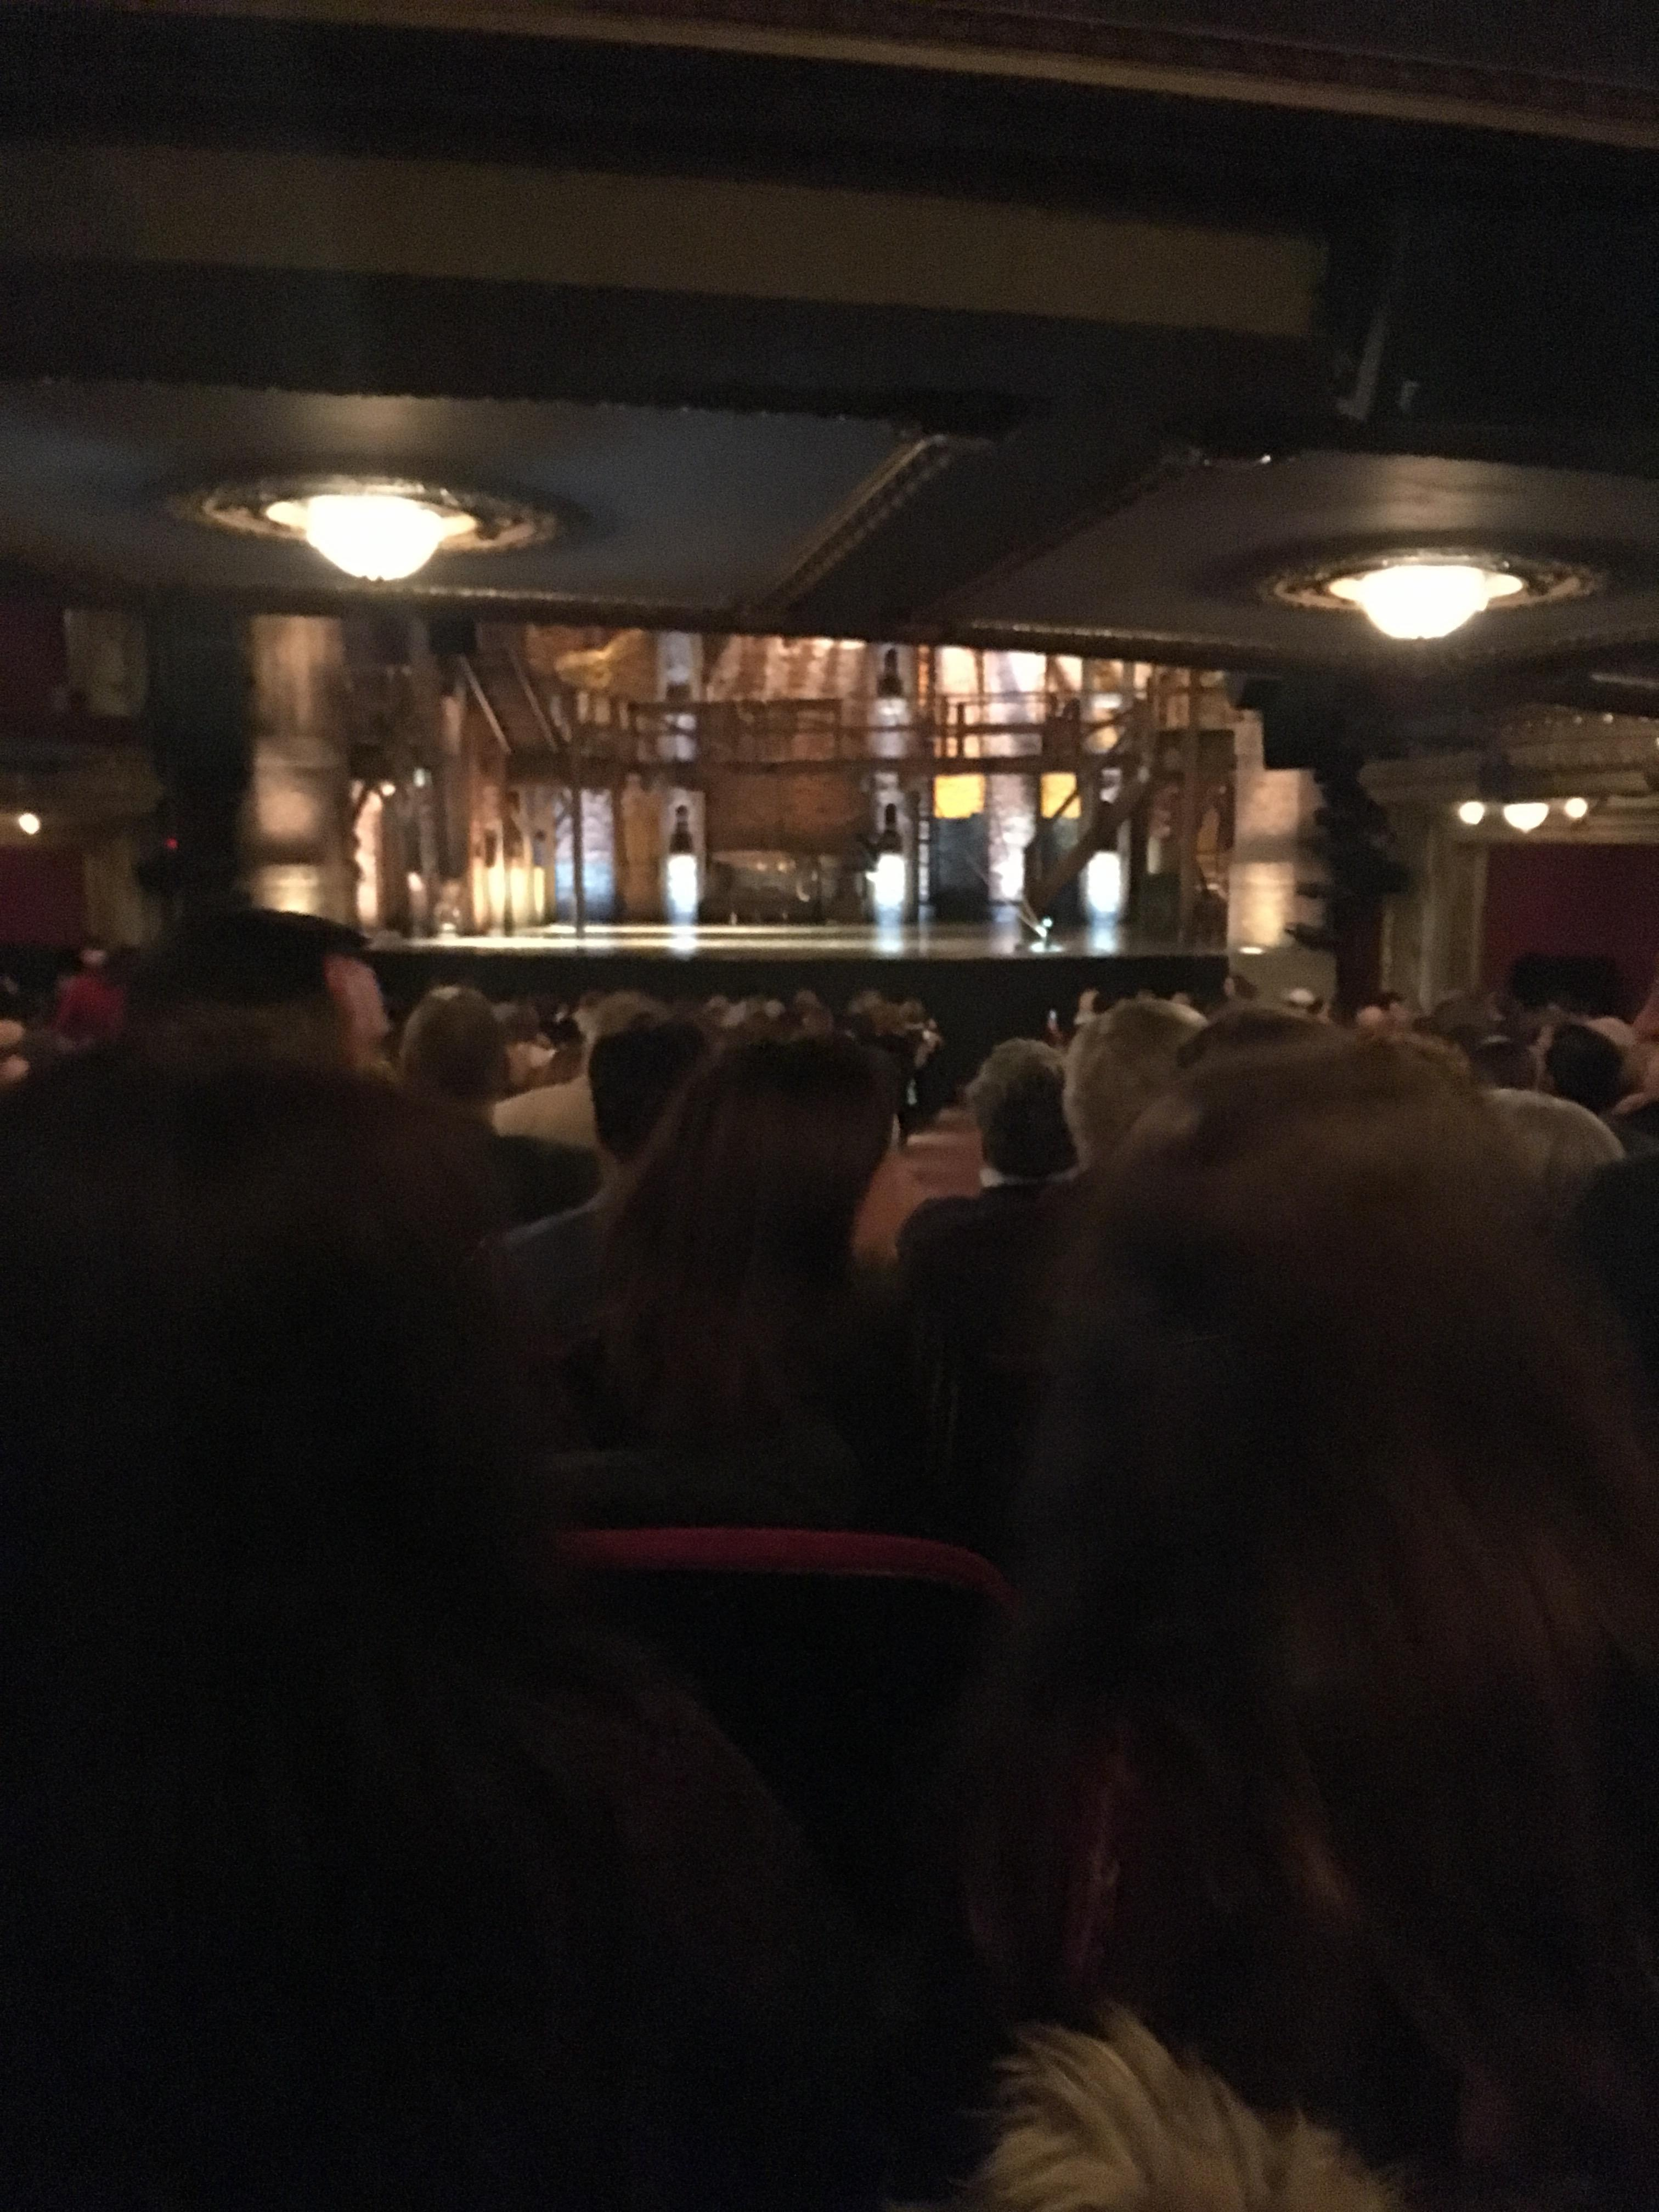 CIBC Theatre Section Orchestra C Row Z Seat 120